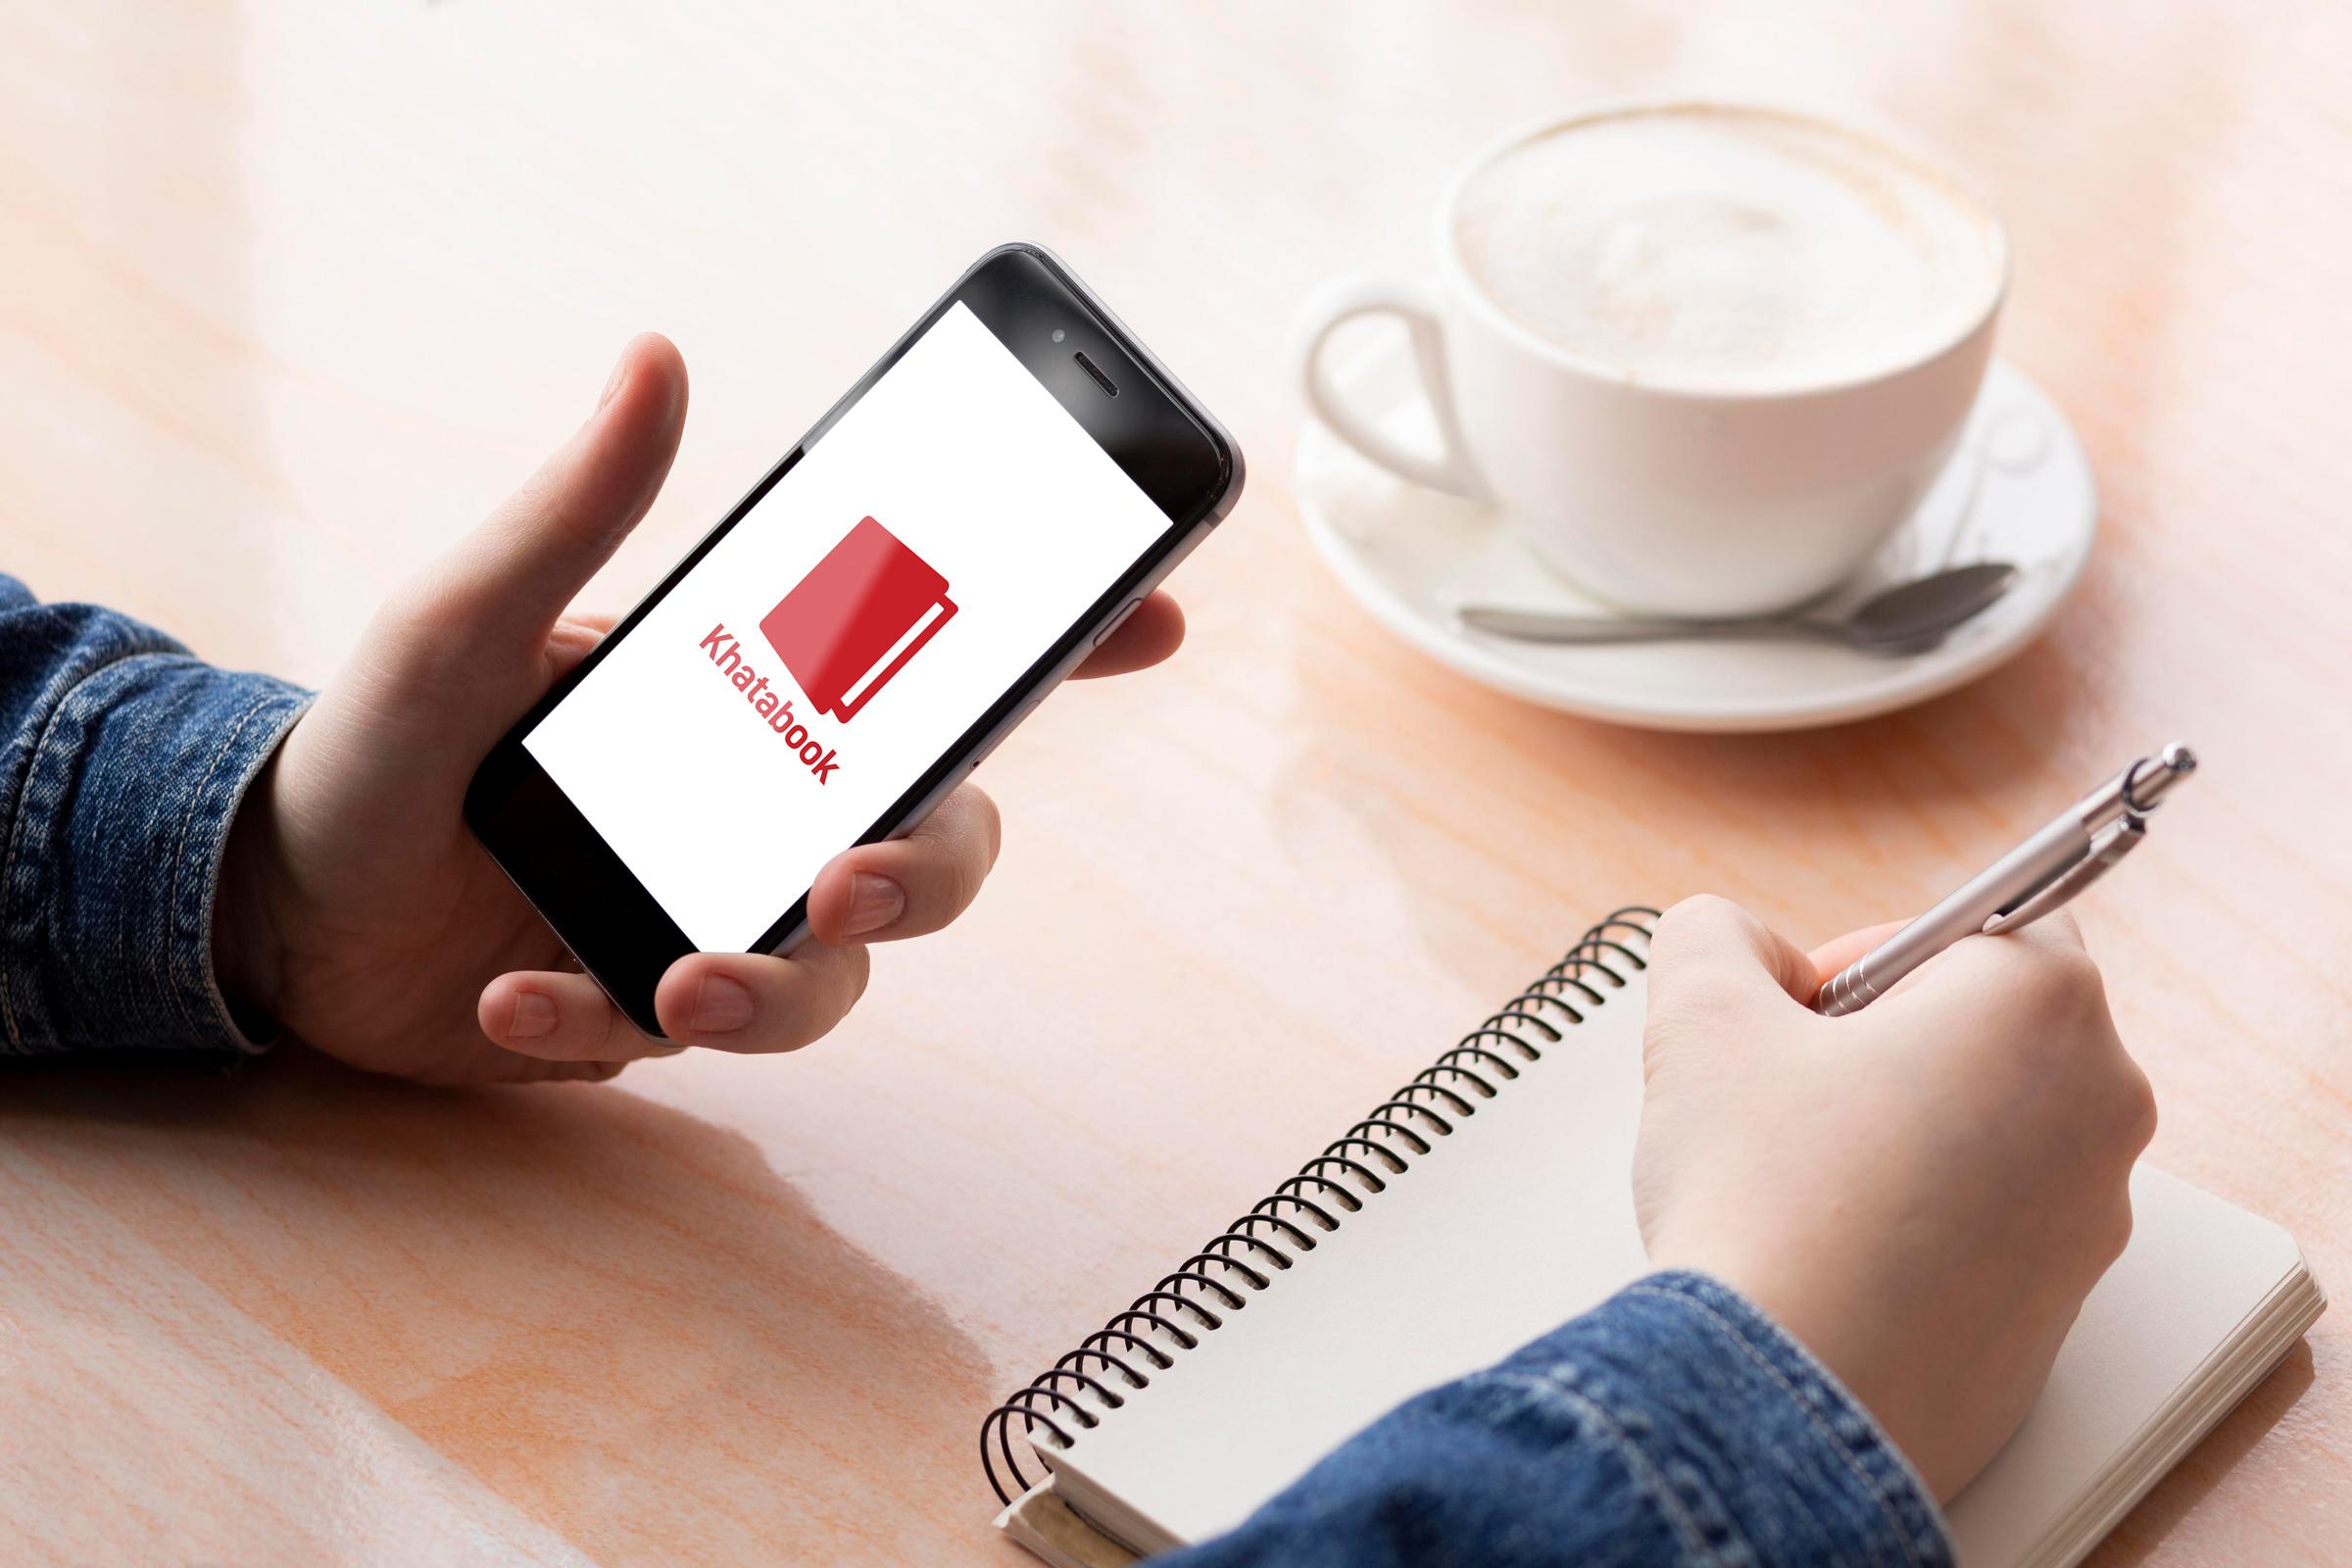 Man using Khatabook app on his smartphone